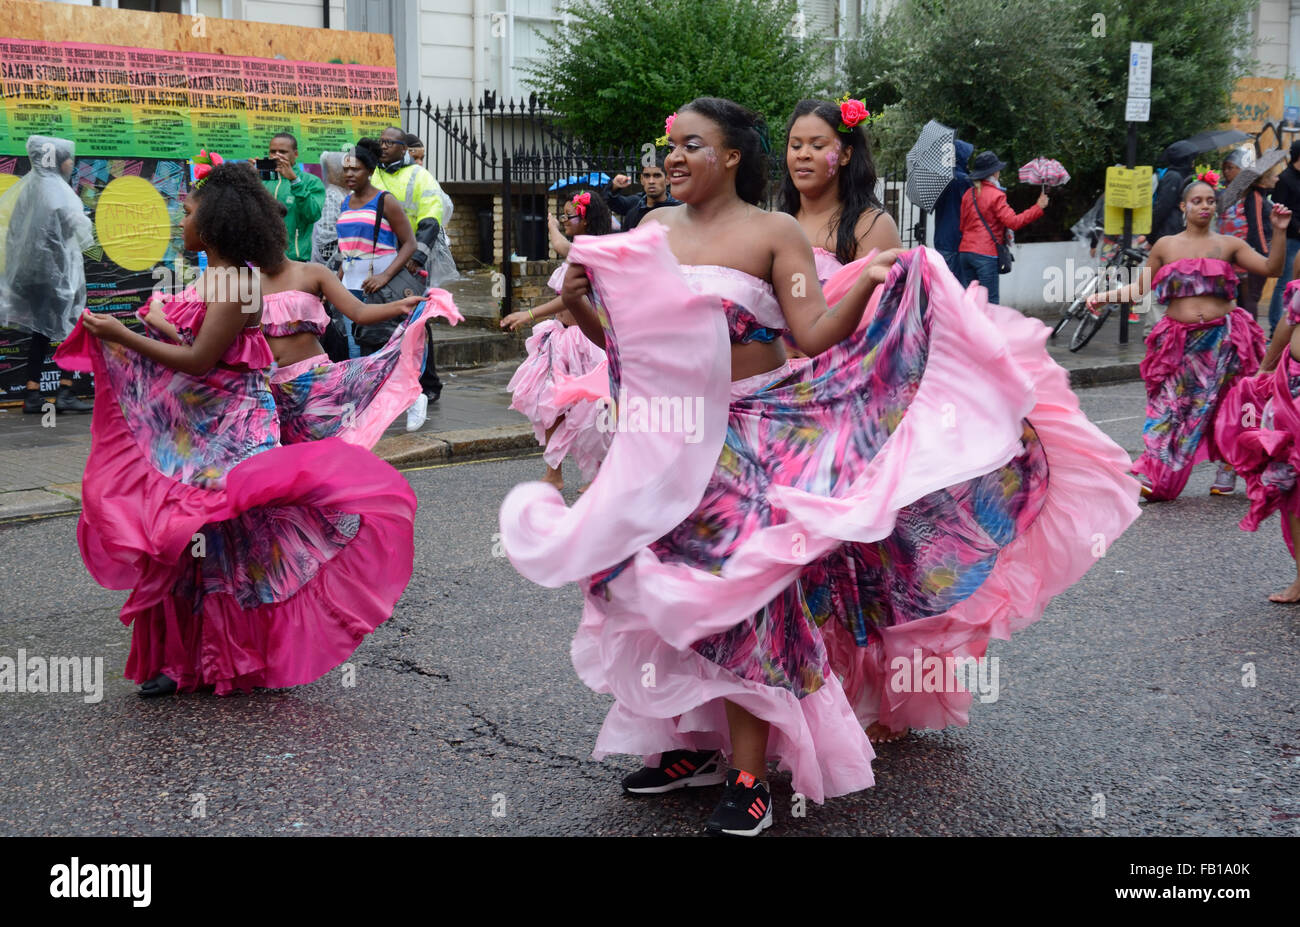 Dancers Notting Hill, London, England. - Stock Image